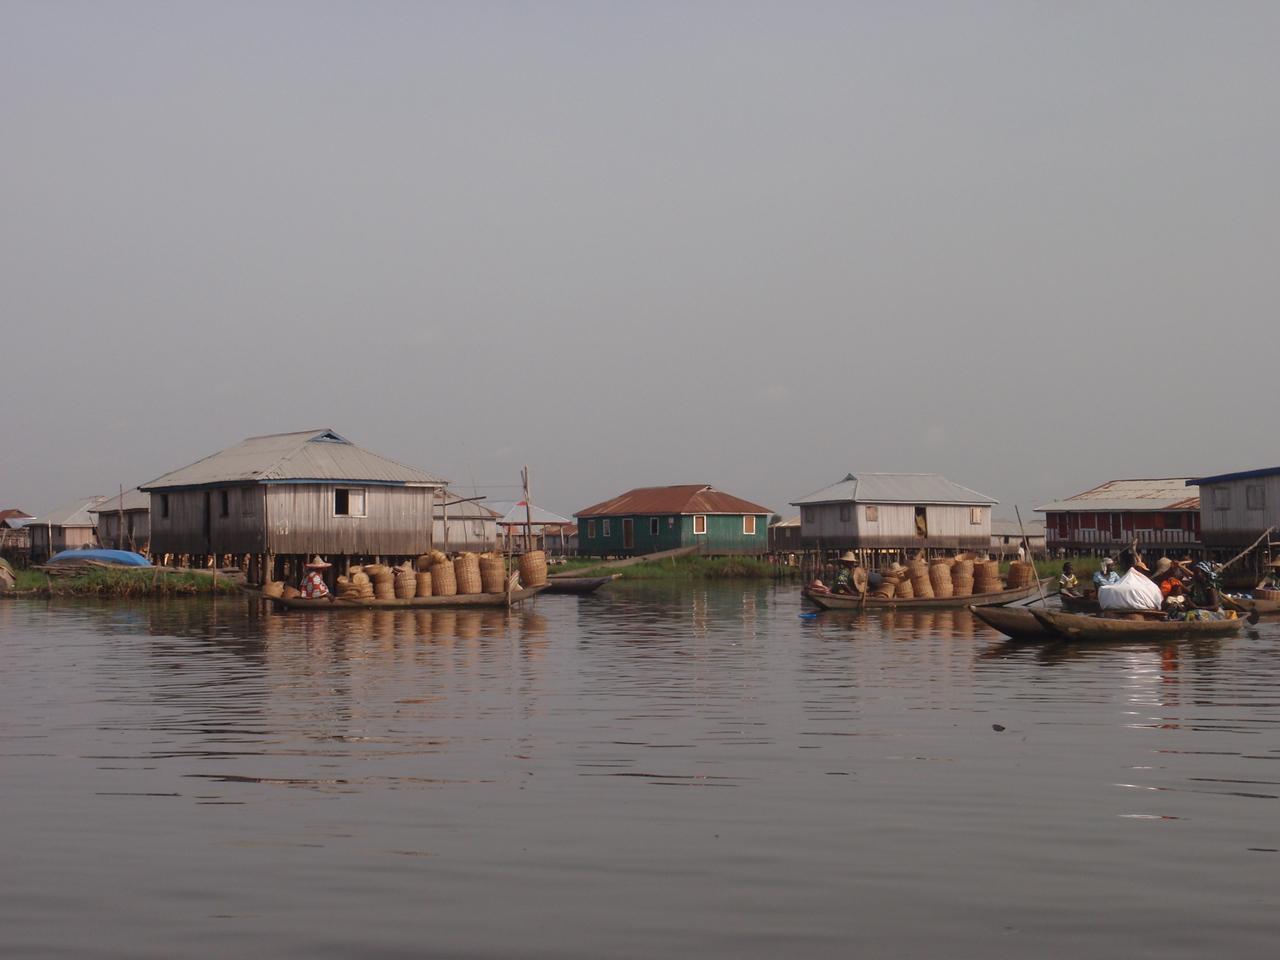 087_Ganvie Lake Community  Lake Nokoue  Bamboo Huts on Stilts